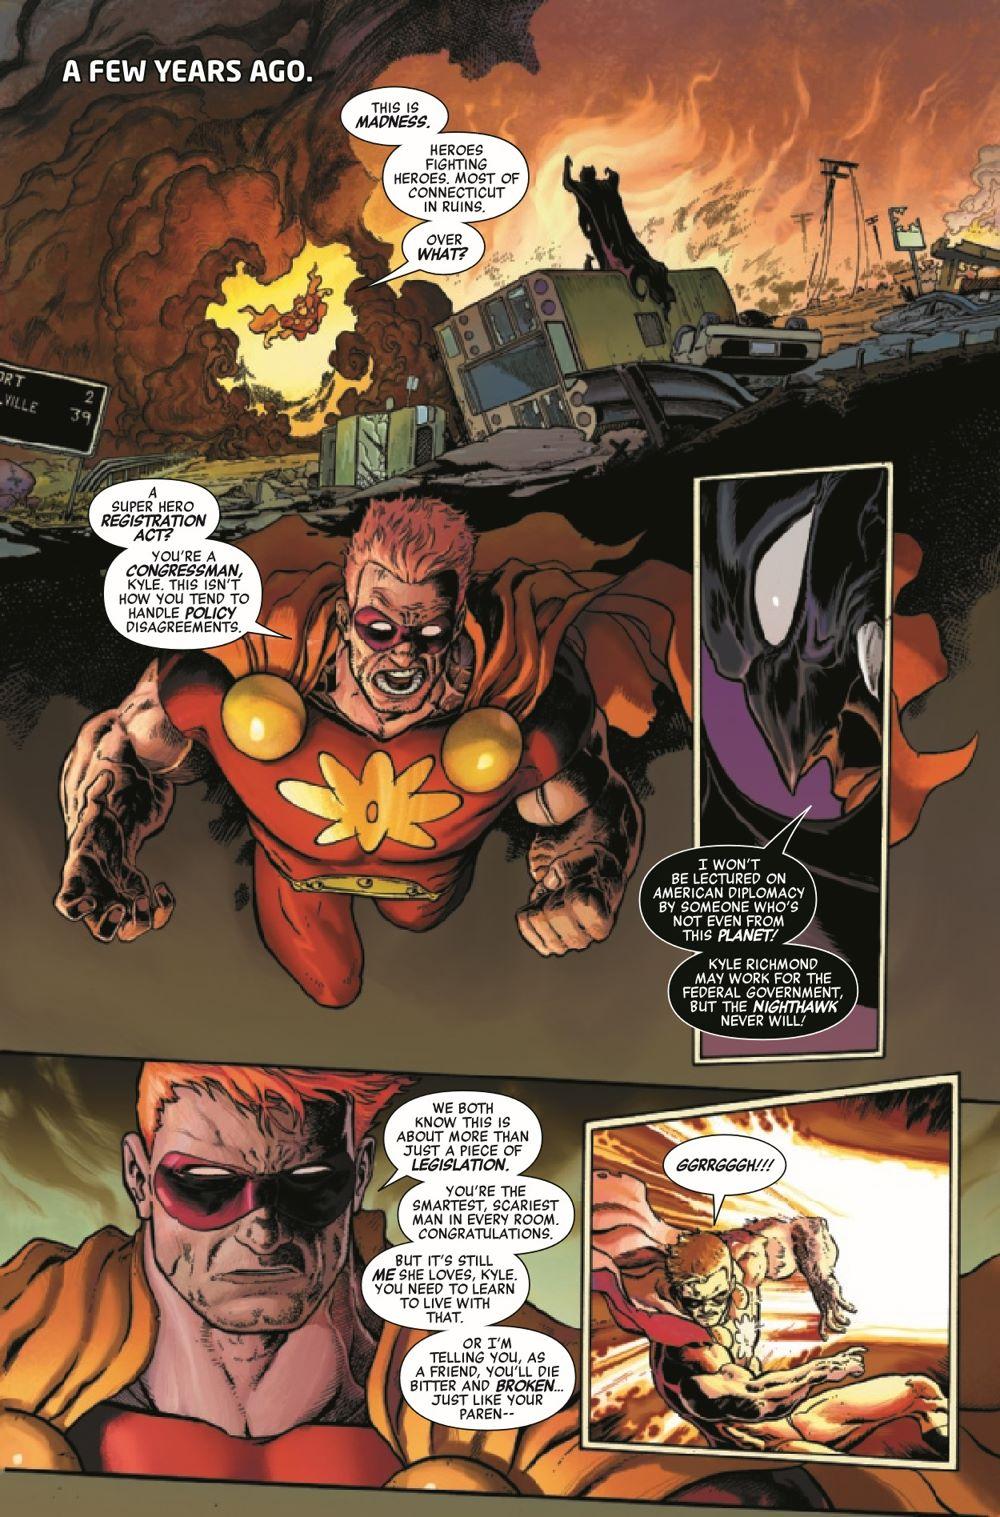 HEROESREBORN2021007_Preview-3 ComicList Previews: HEROES REBORN #7 (OF 7)